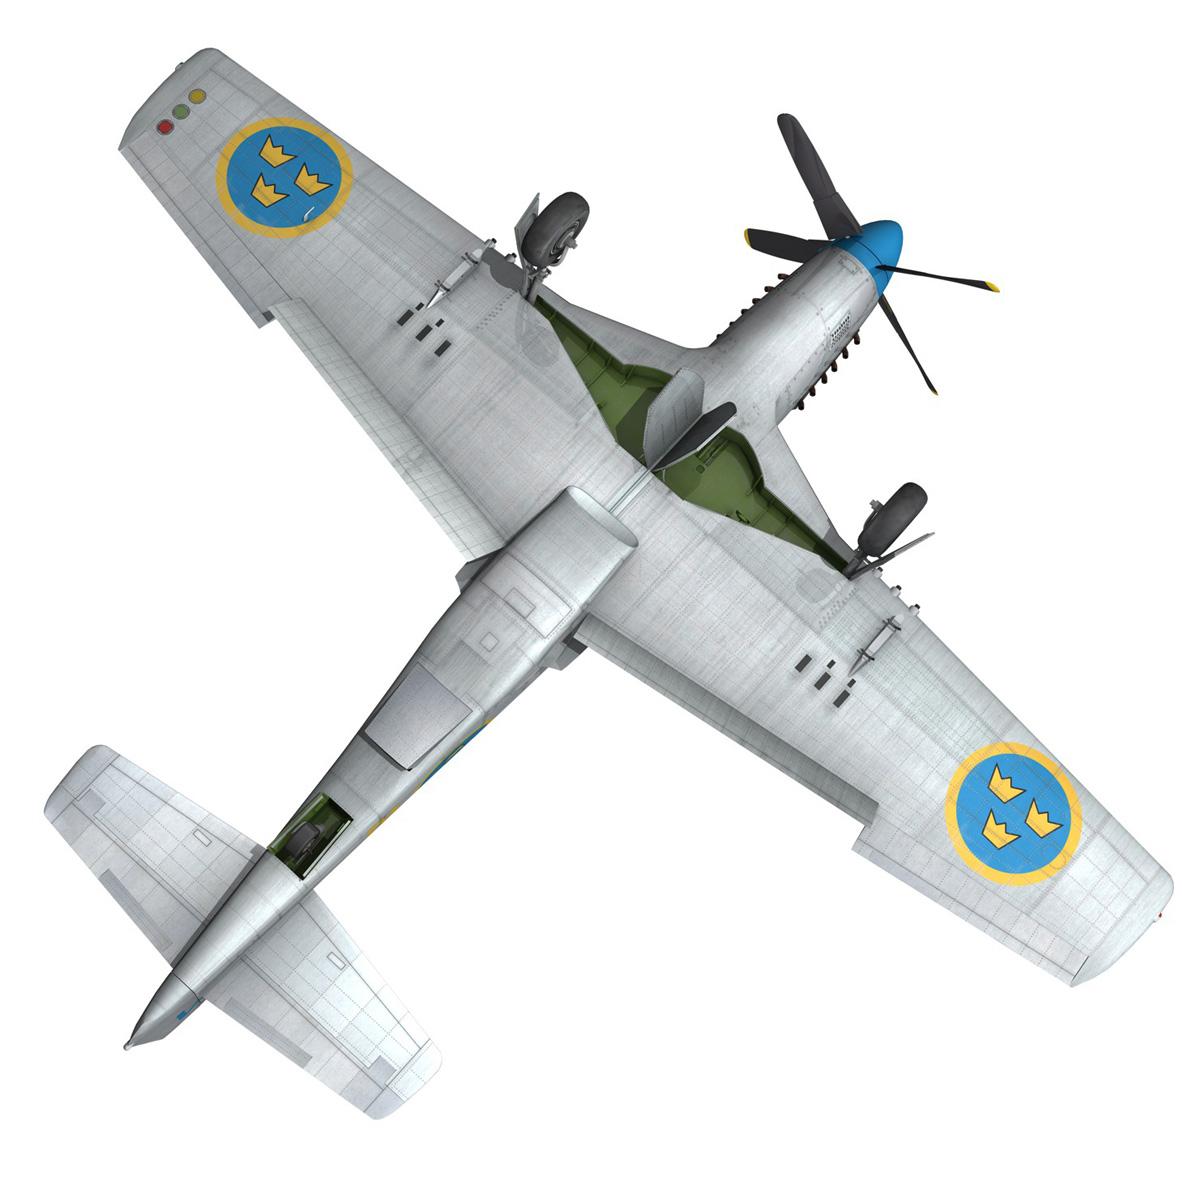 north american p-51d mustang – swedisch airforce 3d model fbx c4d lwo obj 268244